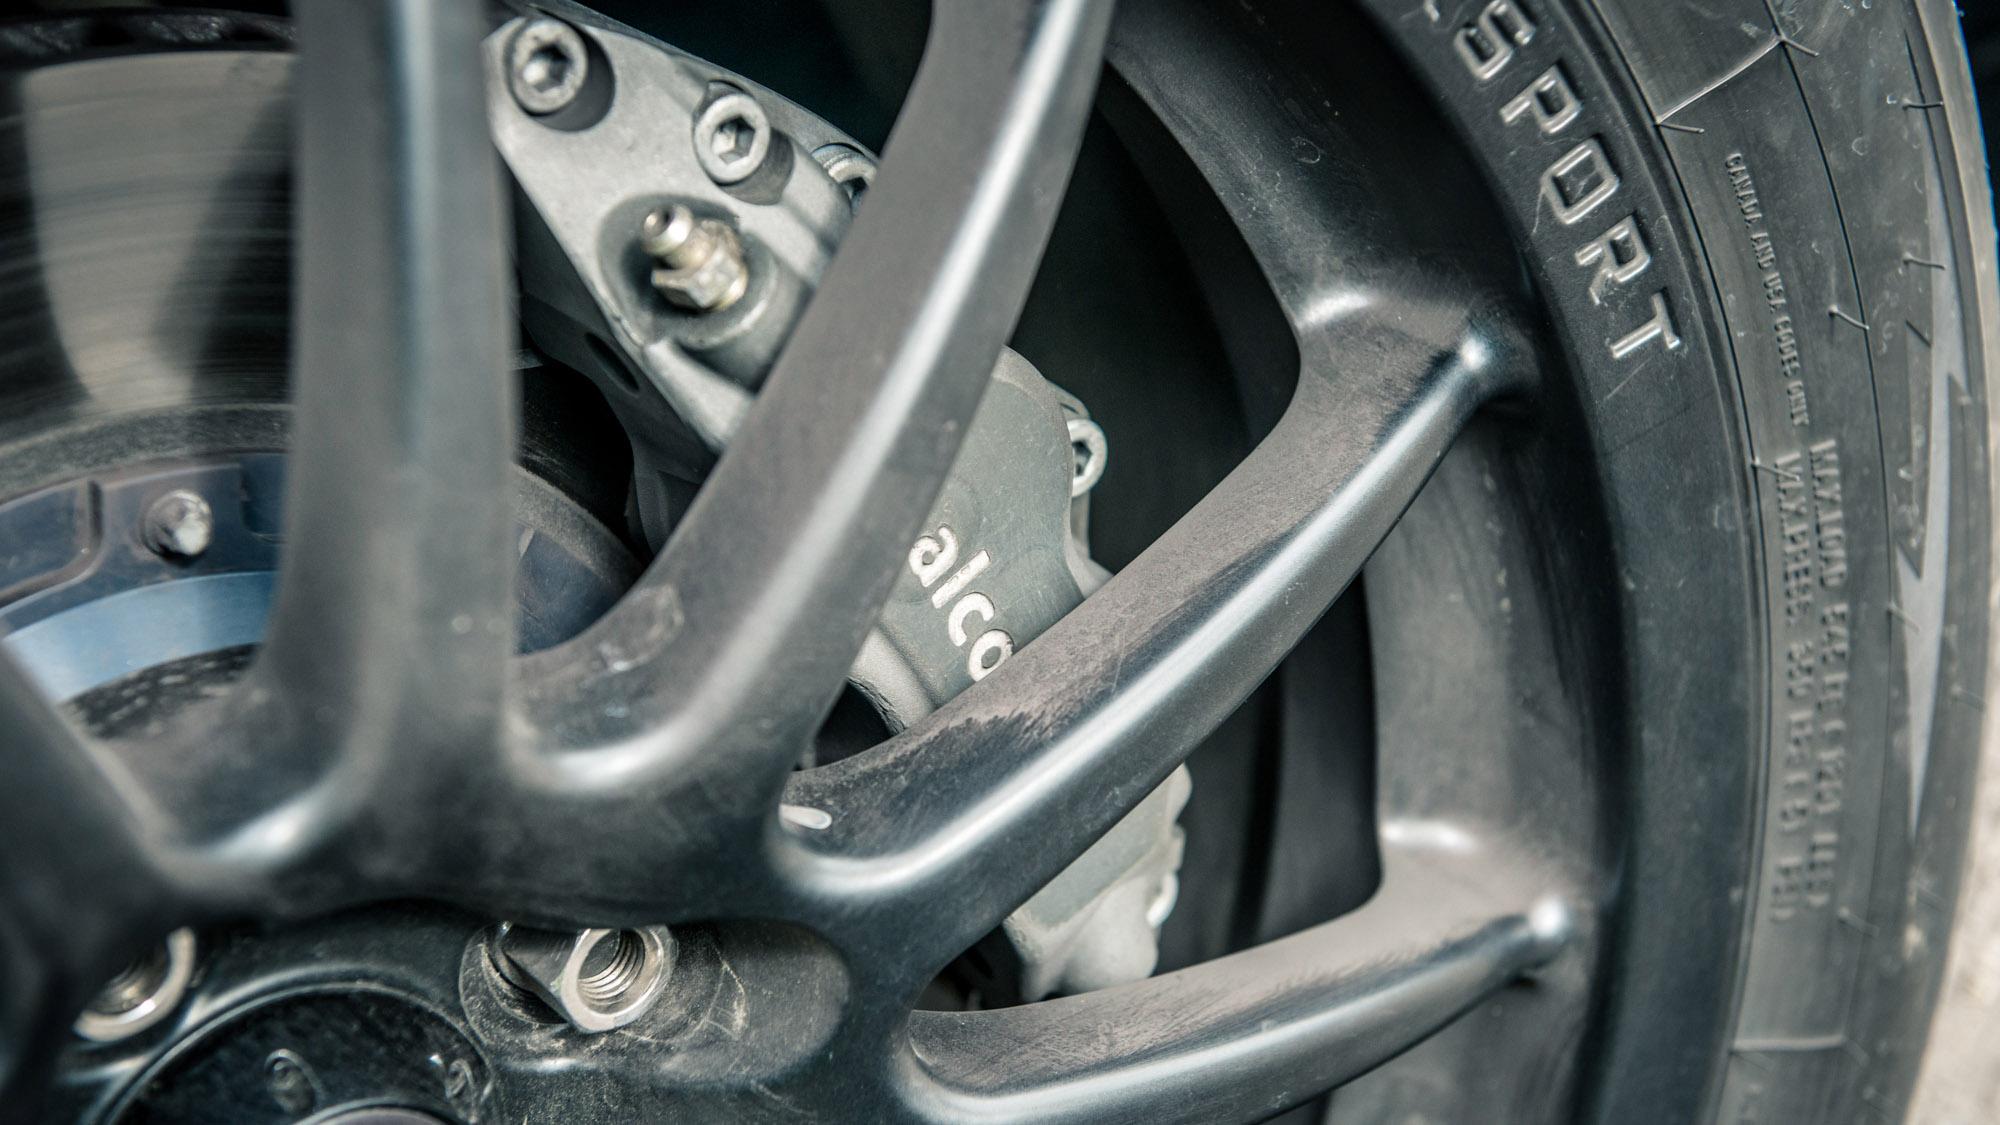 Elemental RP1 wheels